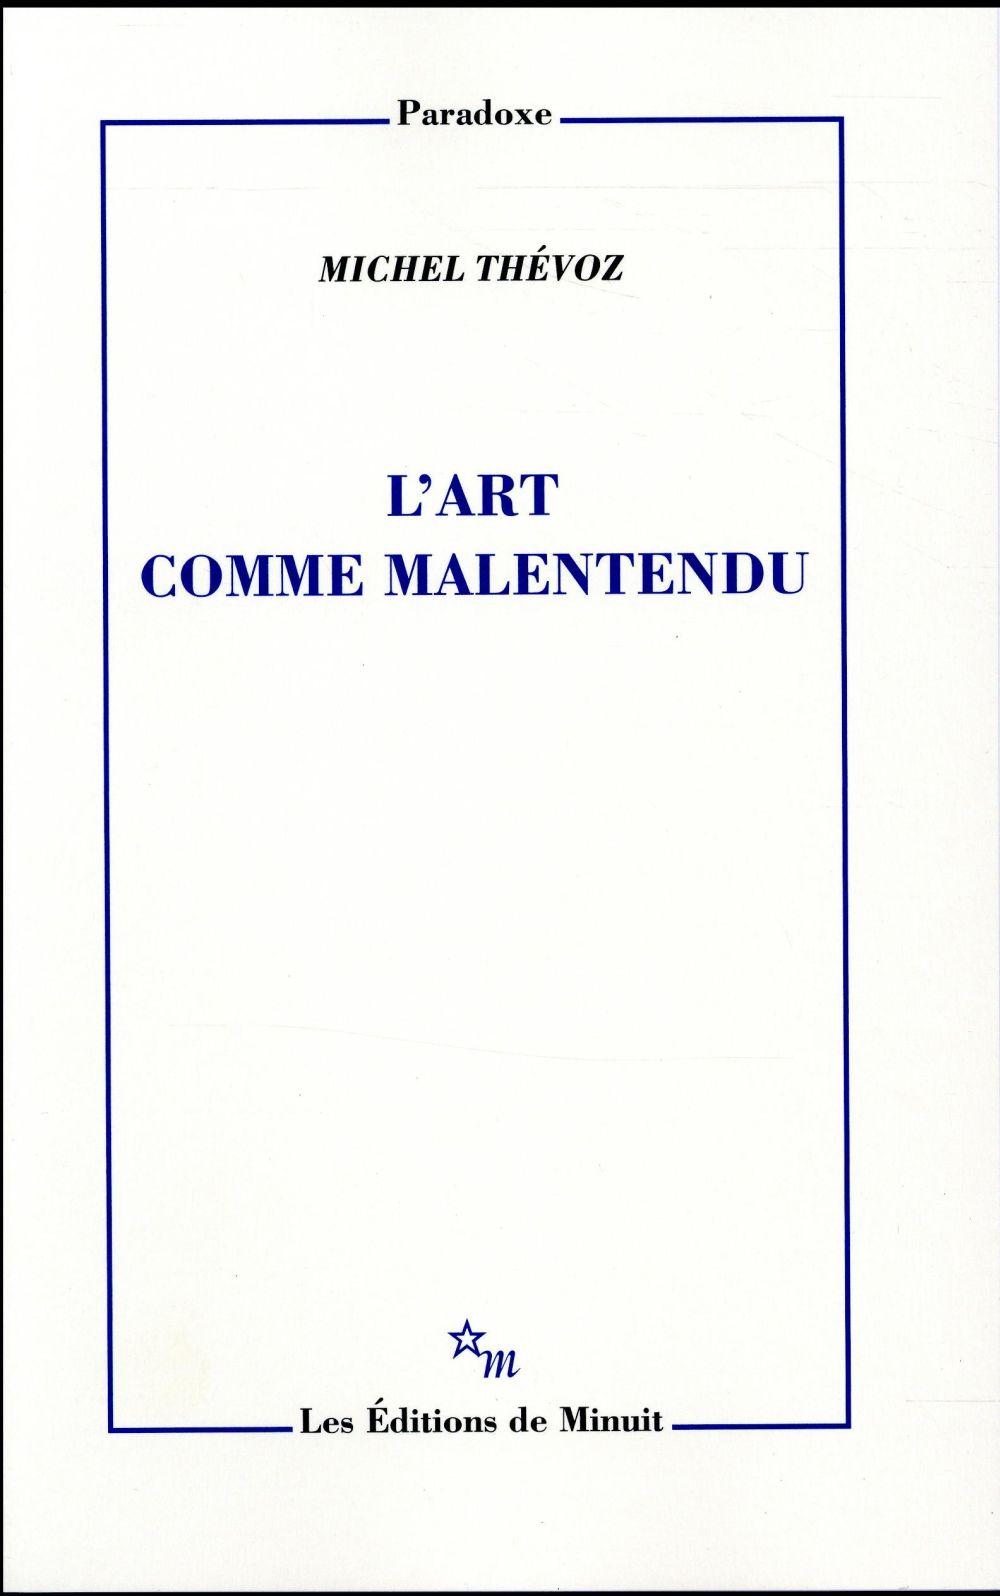 L'ART COMME MALENTENDU